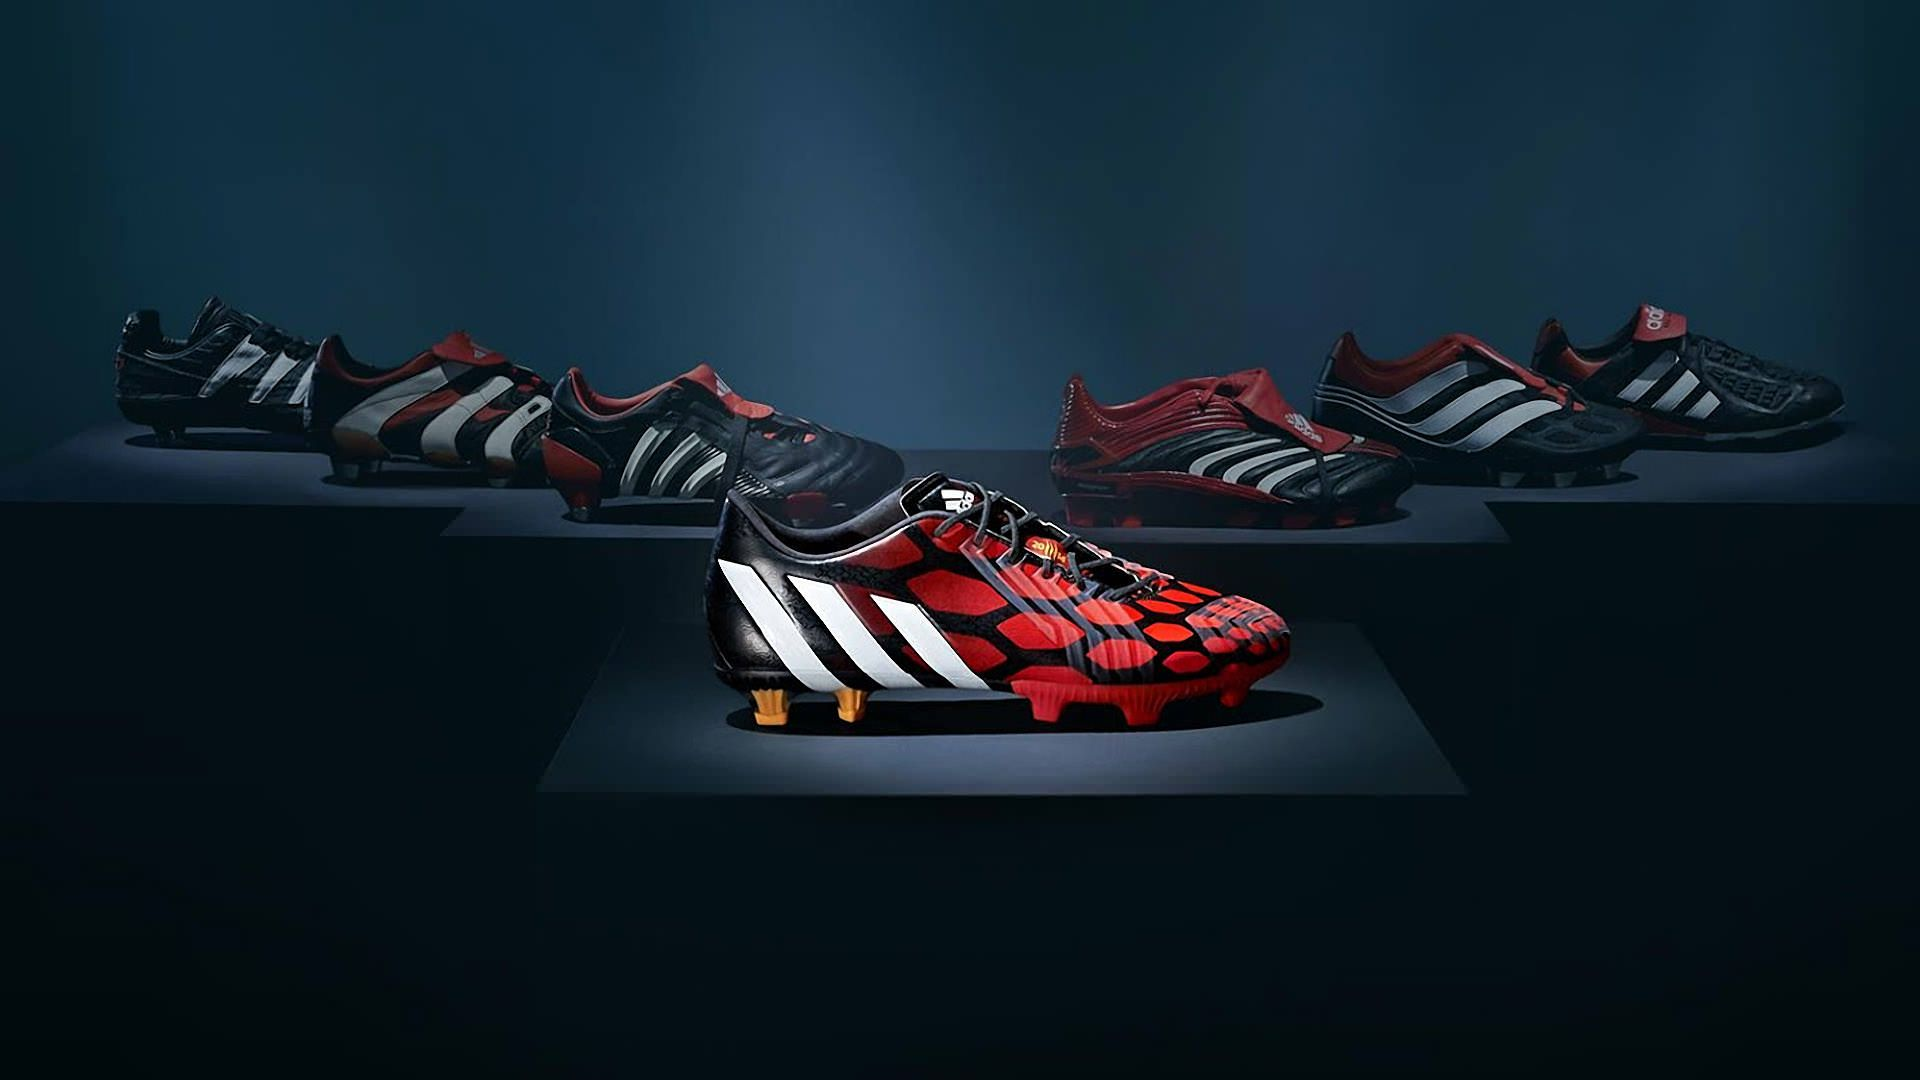 Adidas Hd Wallpapers Hd Wallpapers Inx Adidas Wallpapers Adidas Adidas Boots